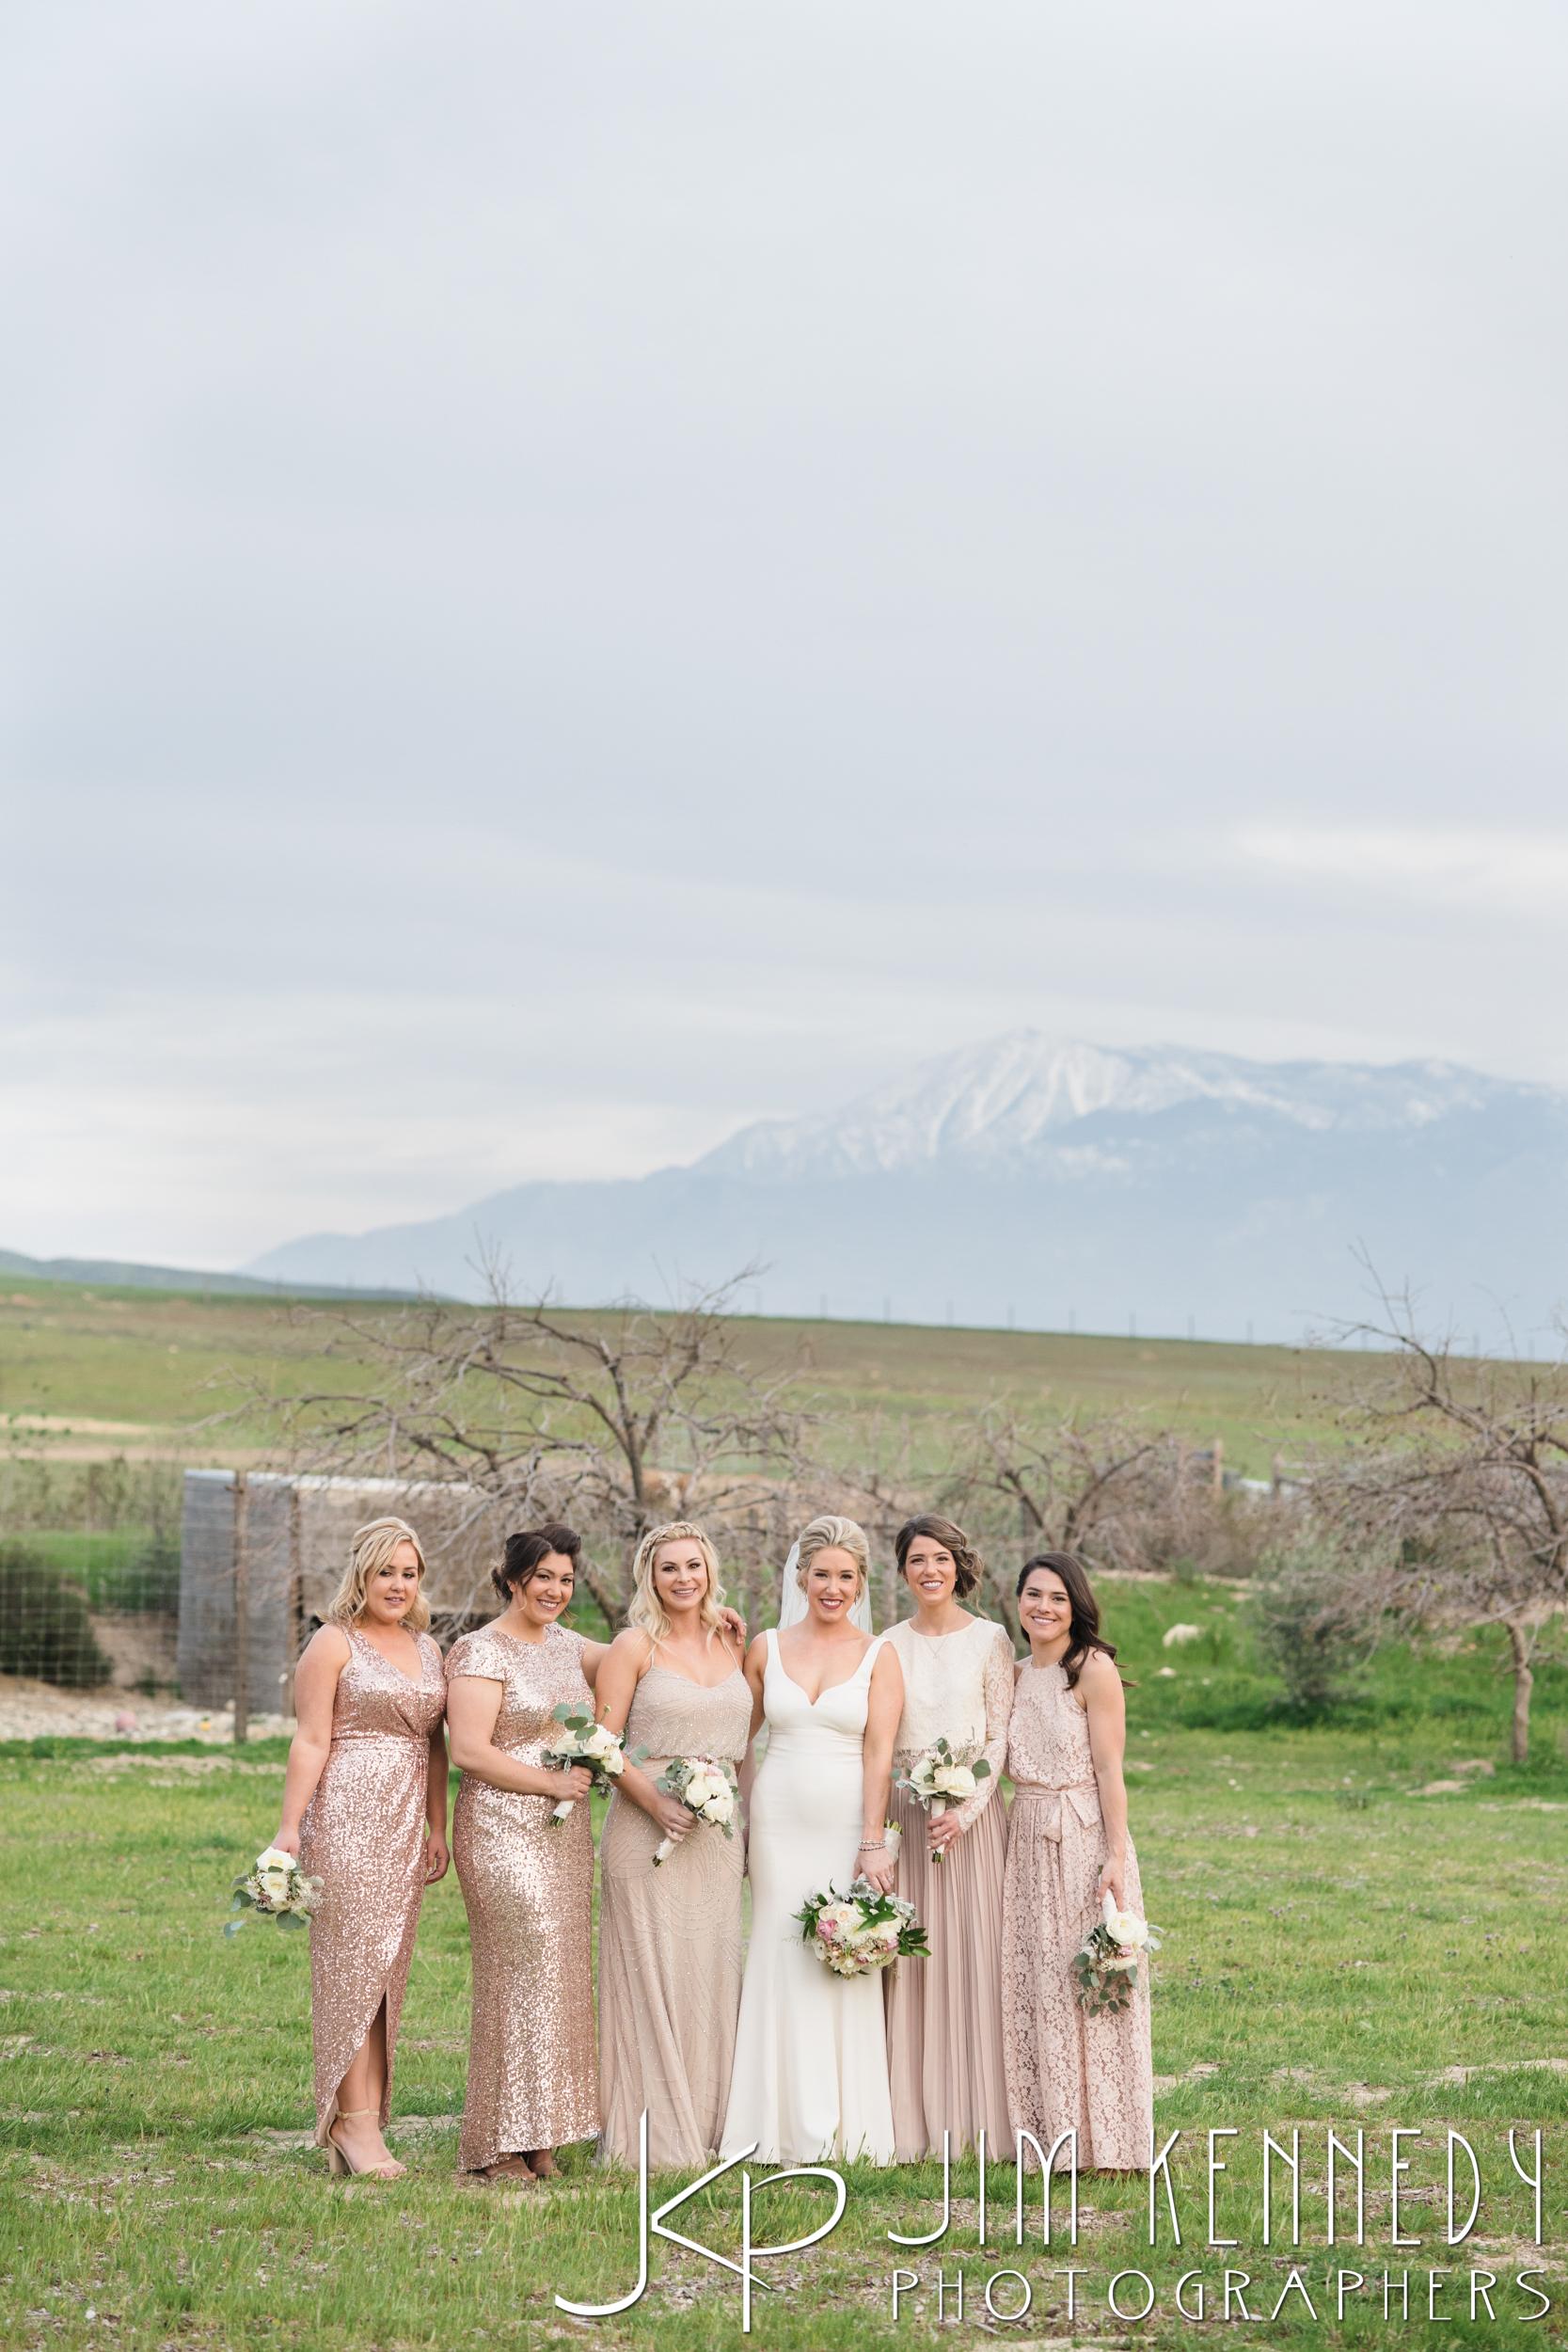 jim_kennedy_photographers_highland_springs_wedding_caitlyn_0134.jpg